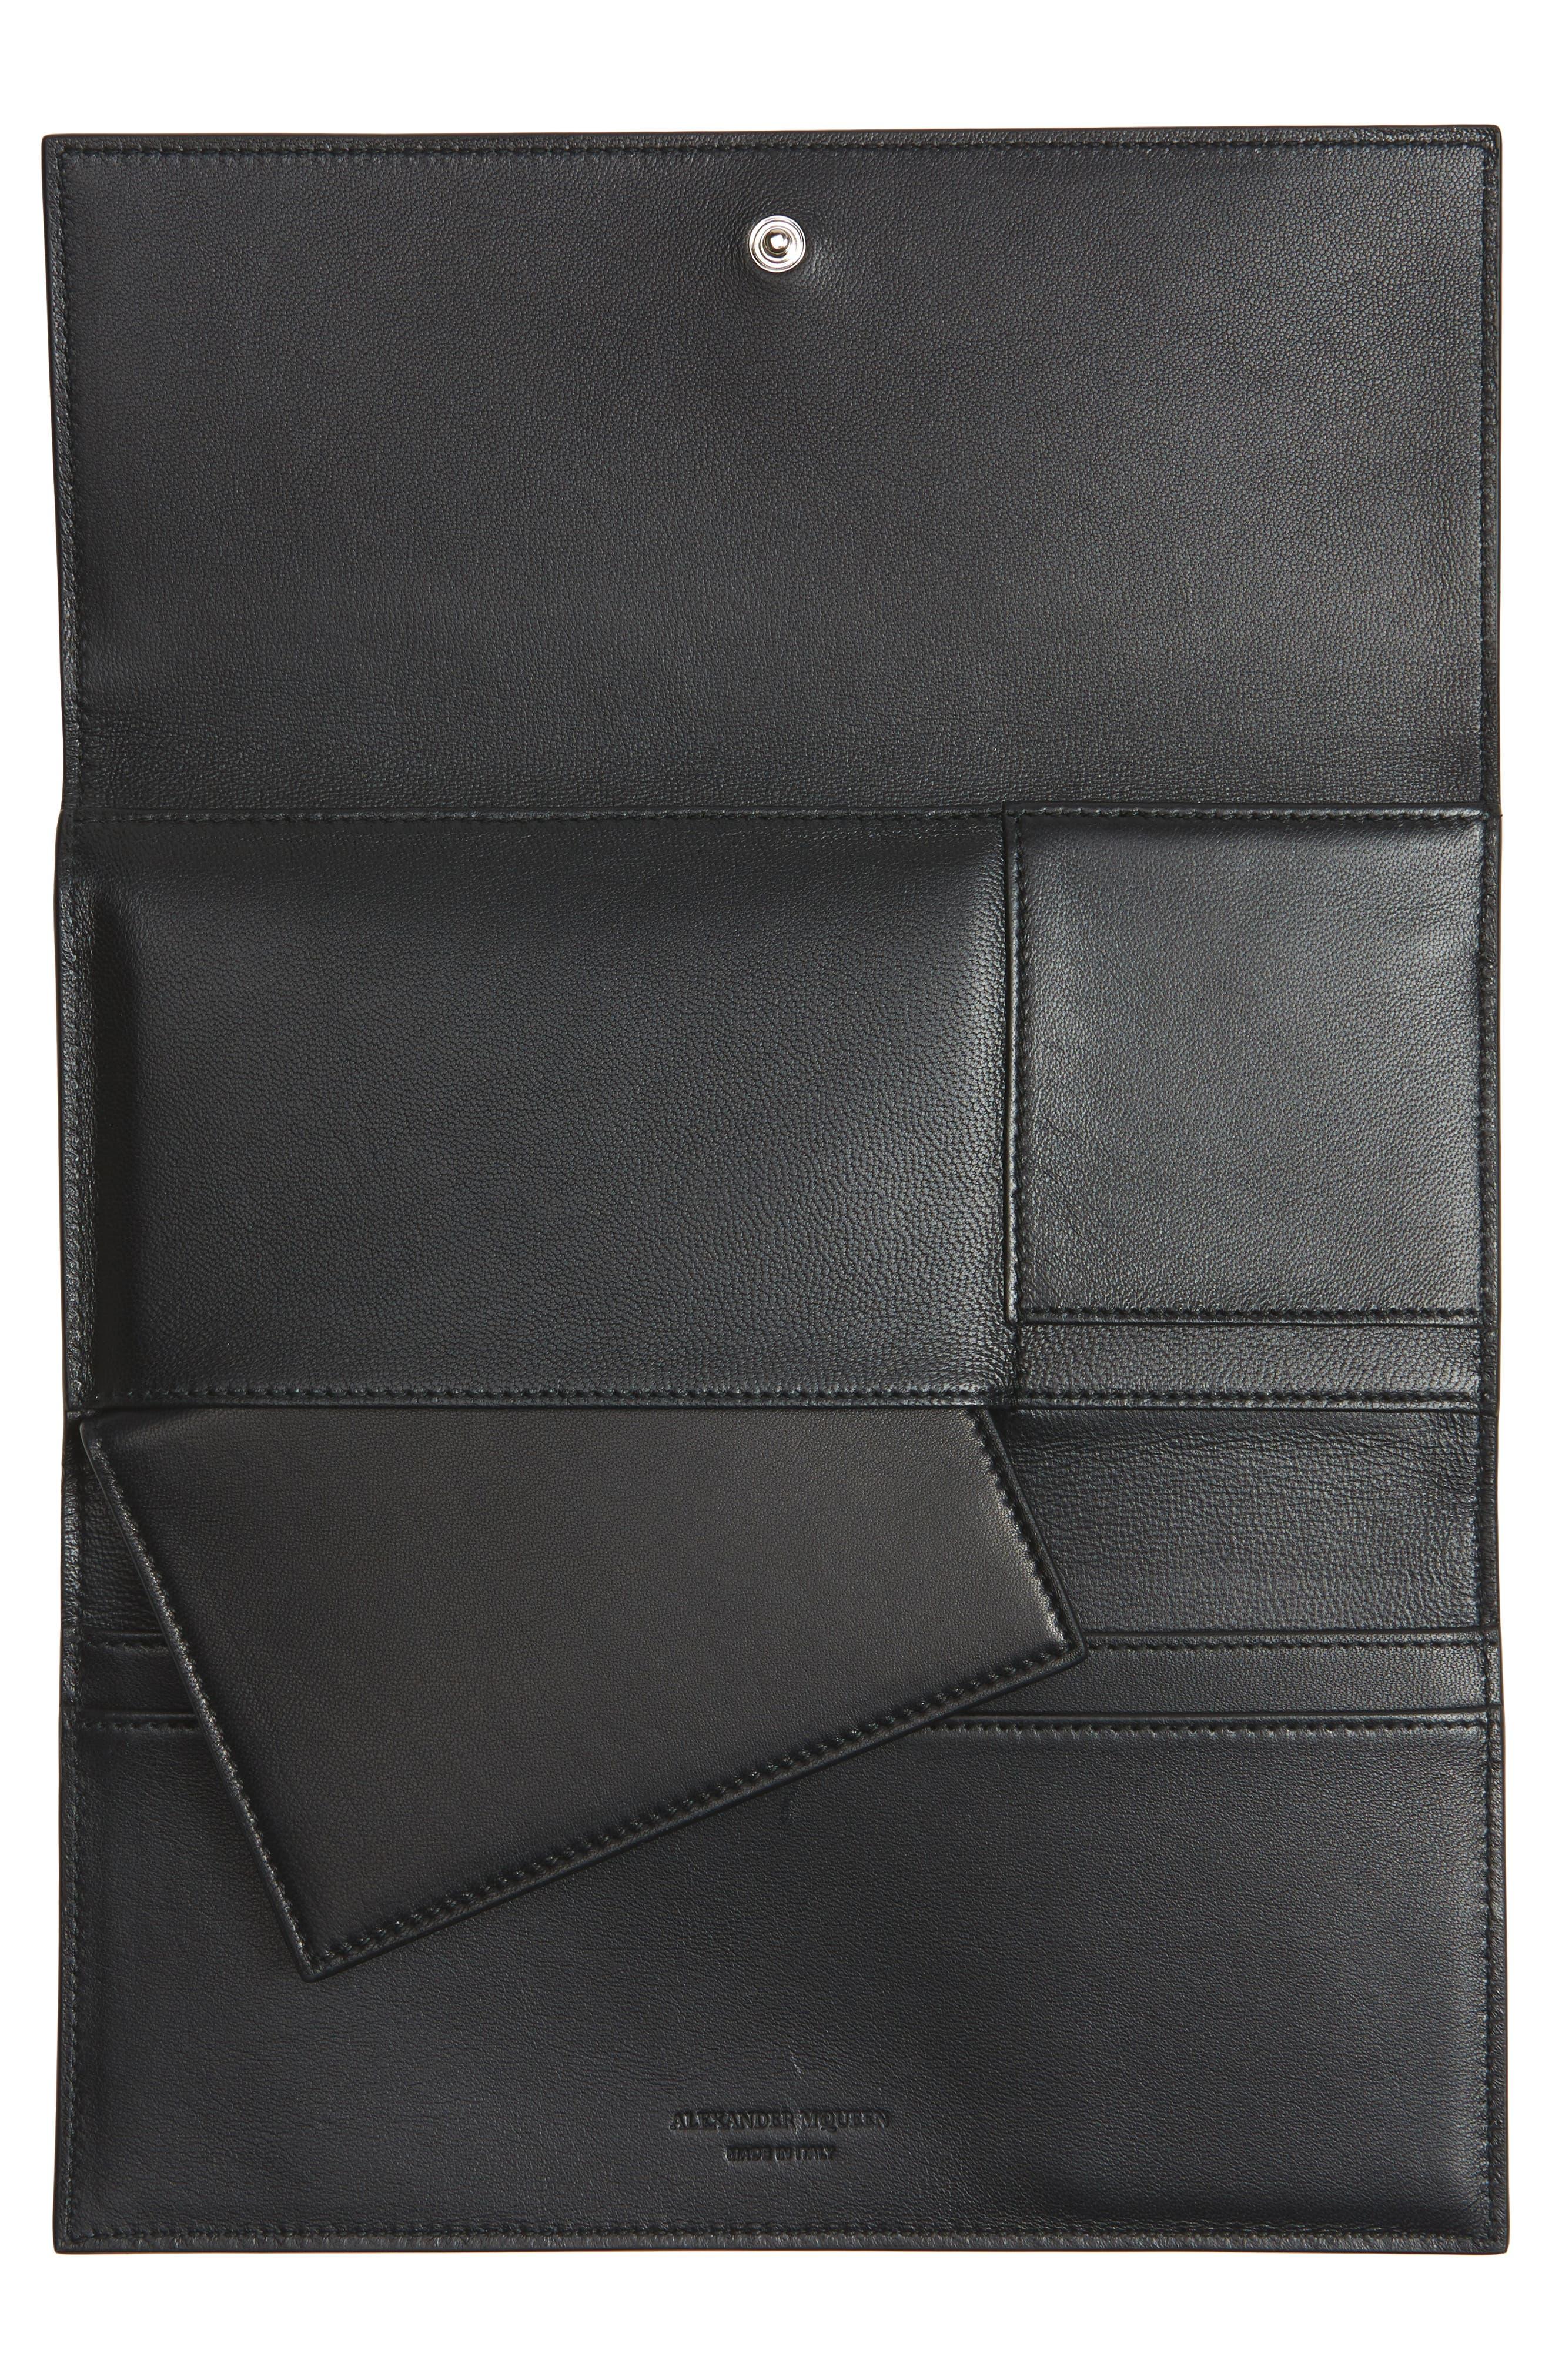 Studded Leather Travel Wallet,                             Alternate thumbnail 4, color,                             BLACK